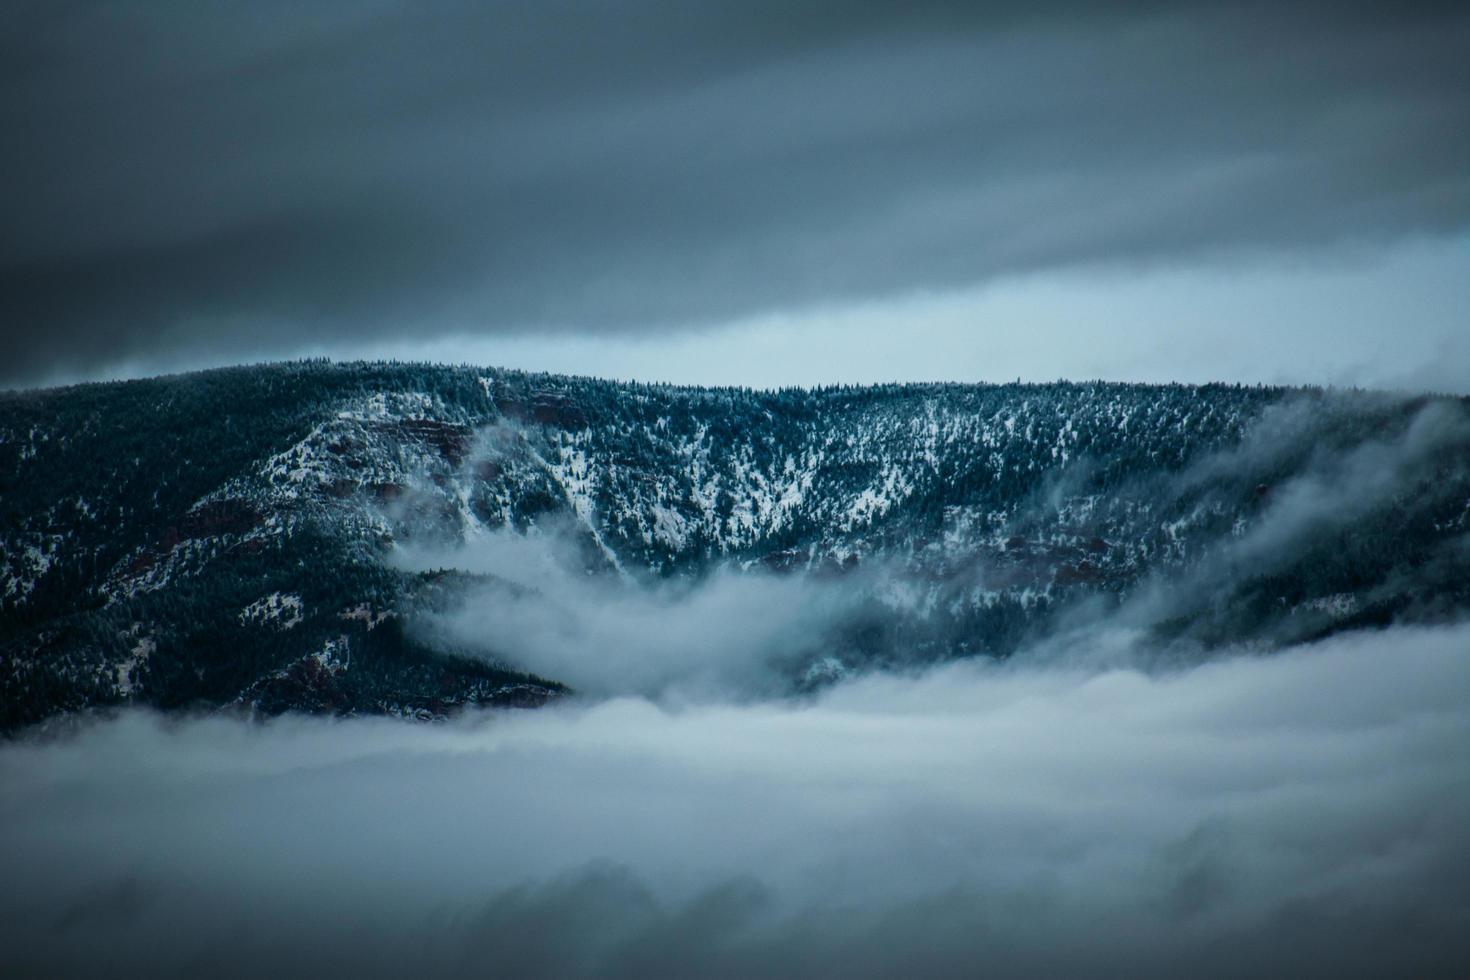 Mountain range surrounded by fog photo